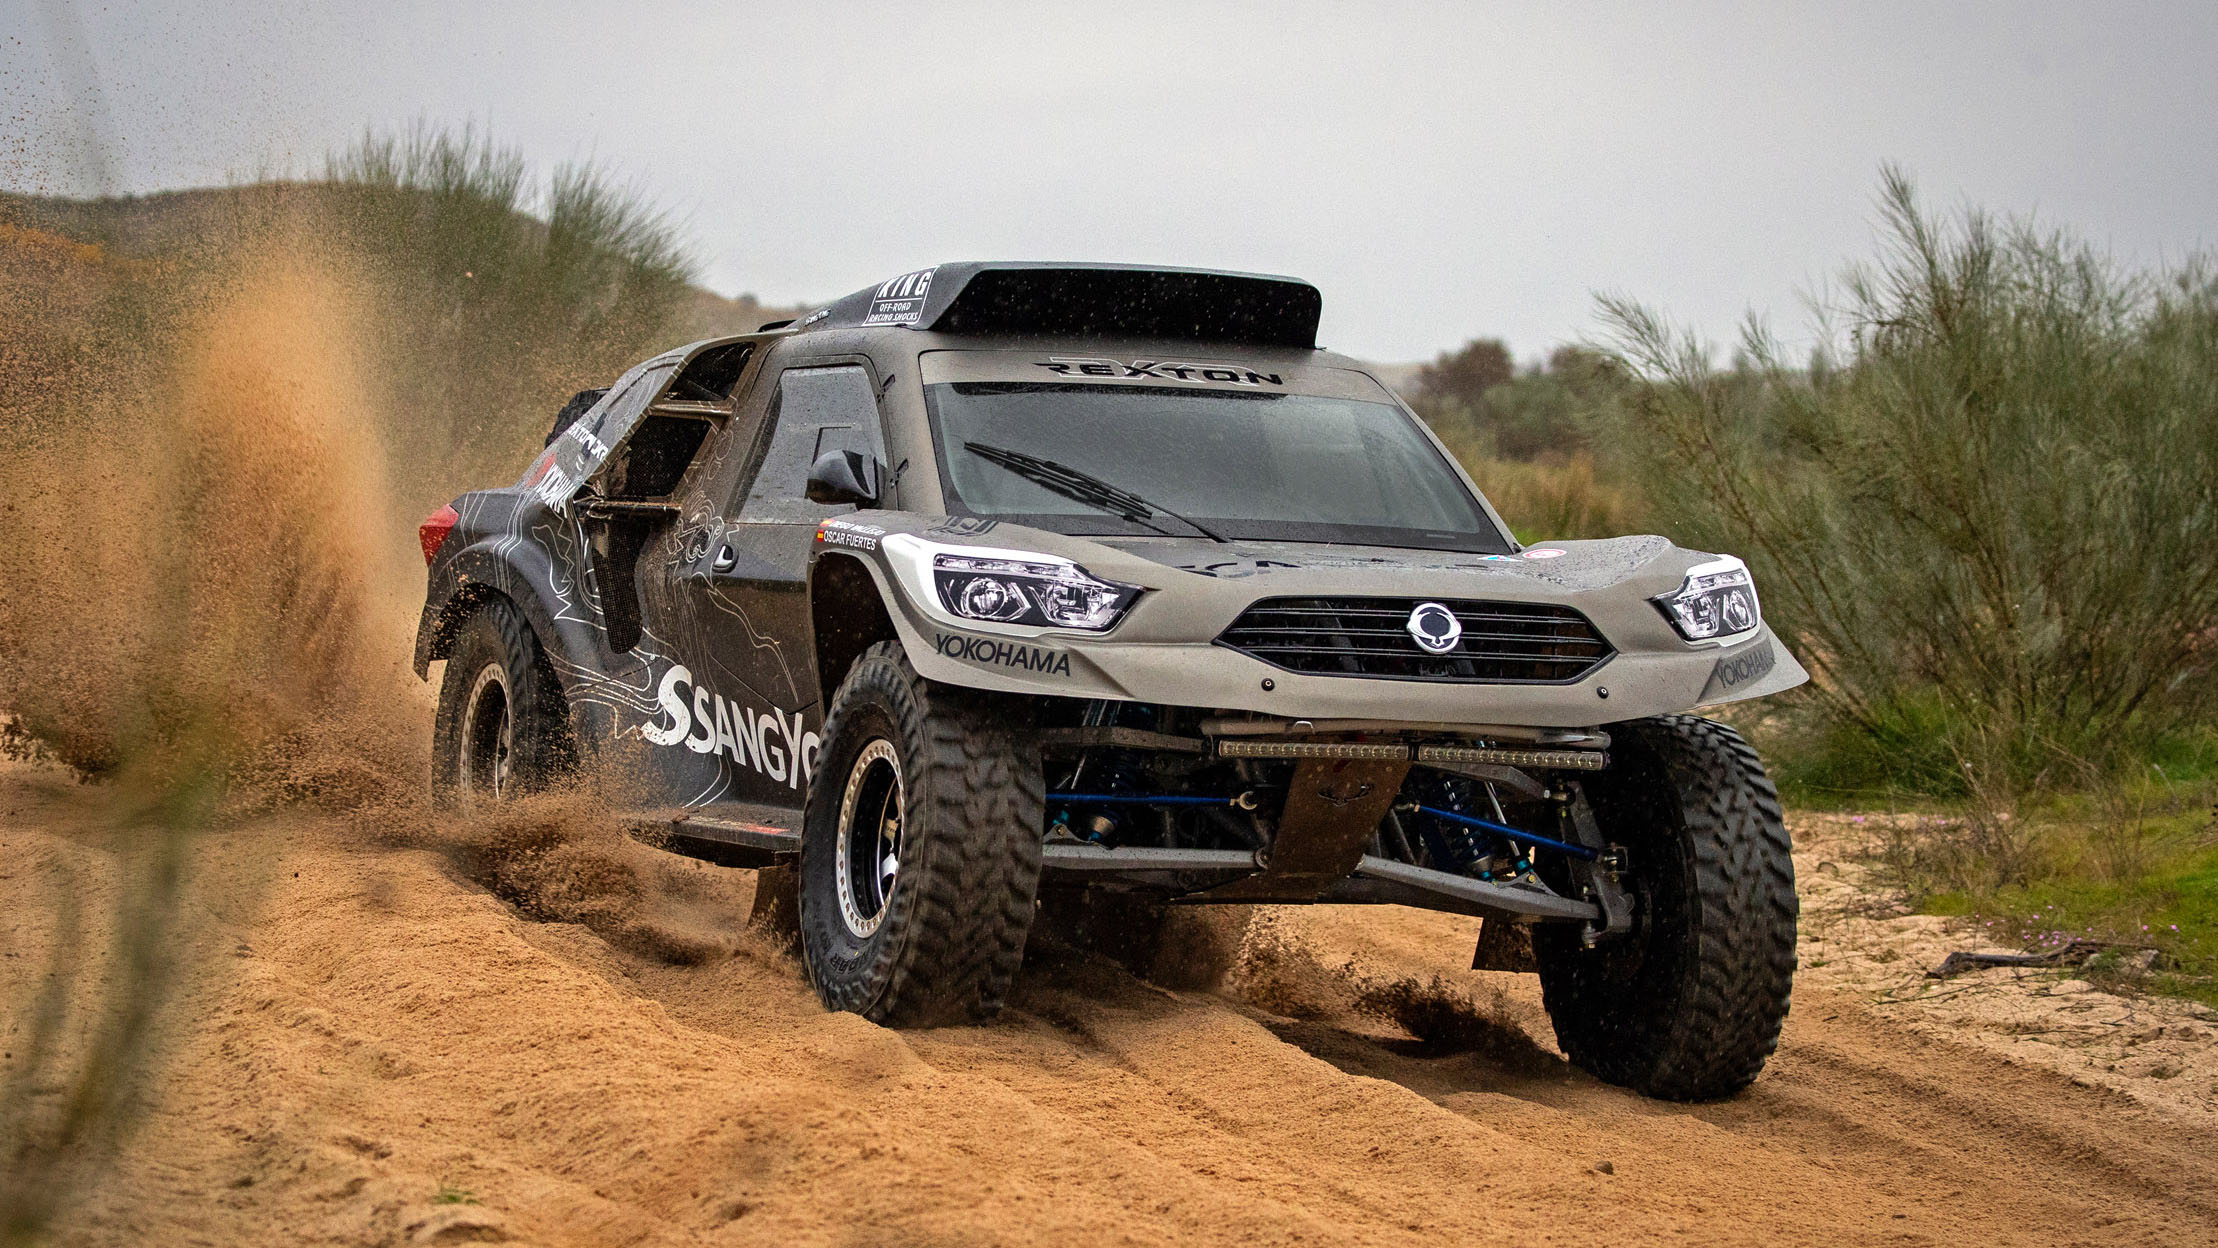 Ssangyong Rexton DKR to tackle 2019 Dakar Rally | CarAdvice